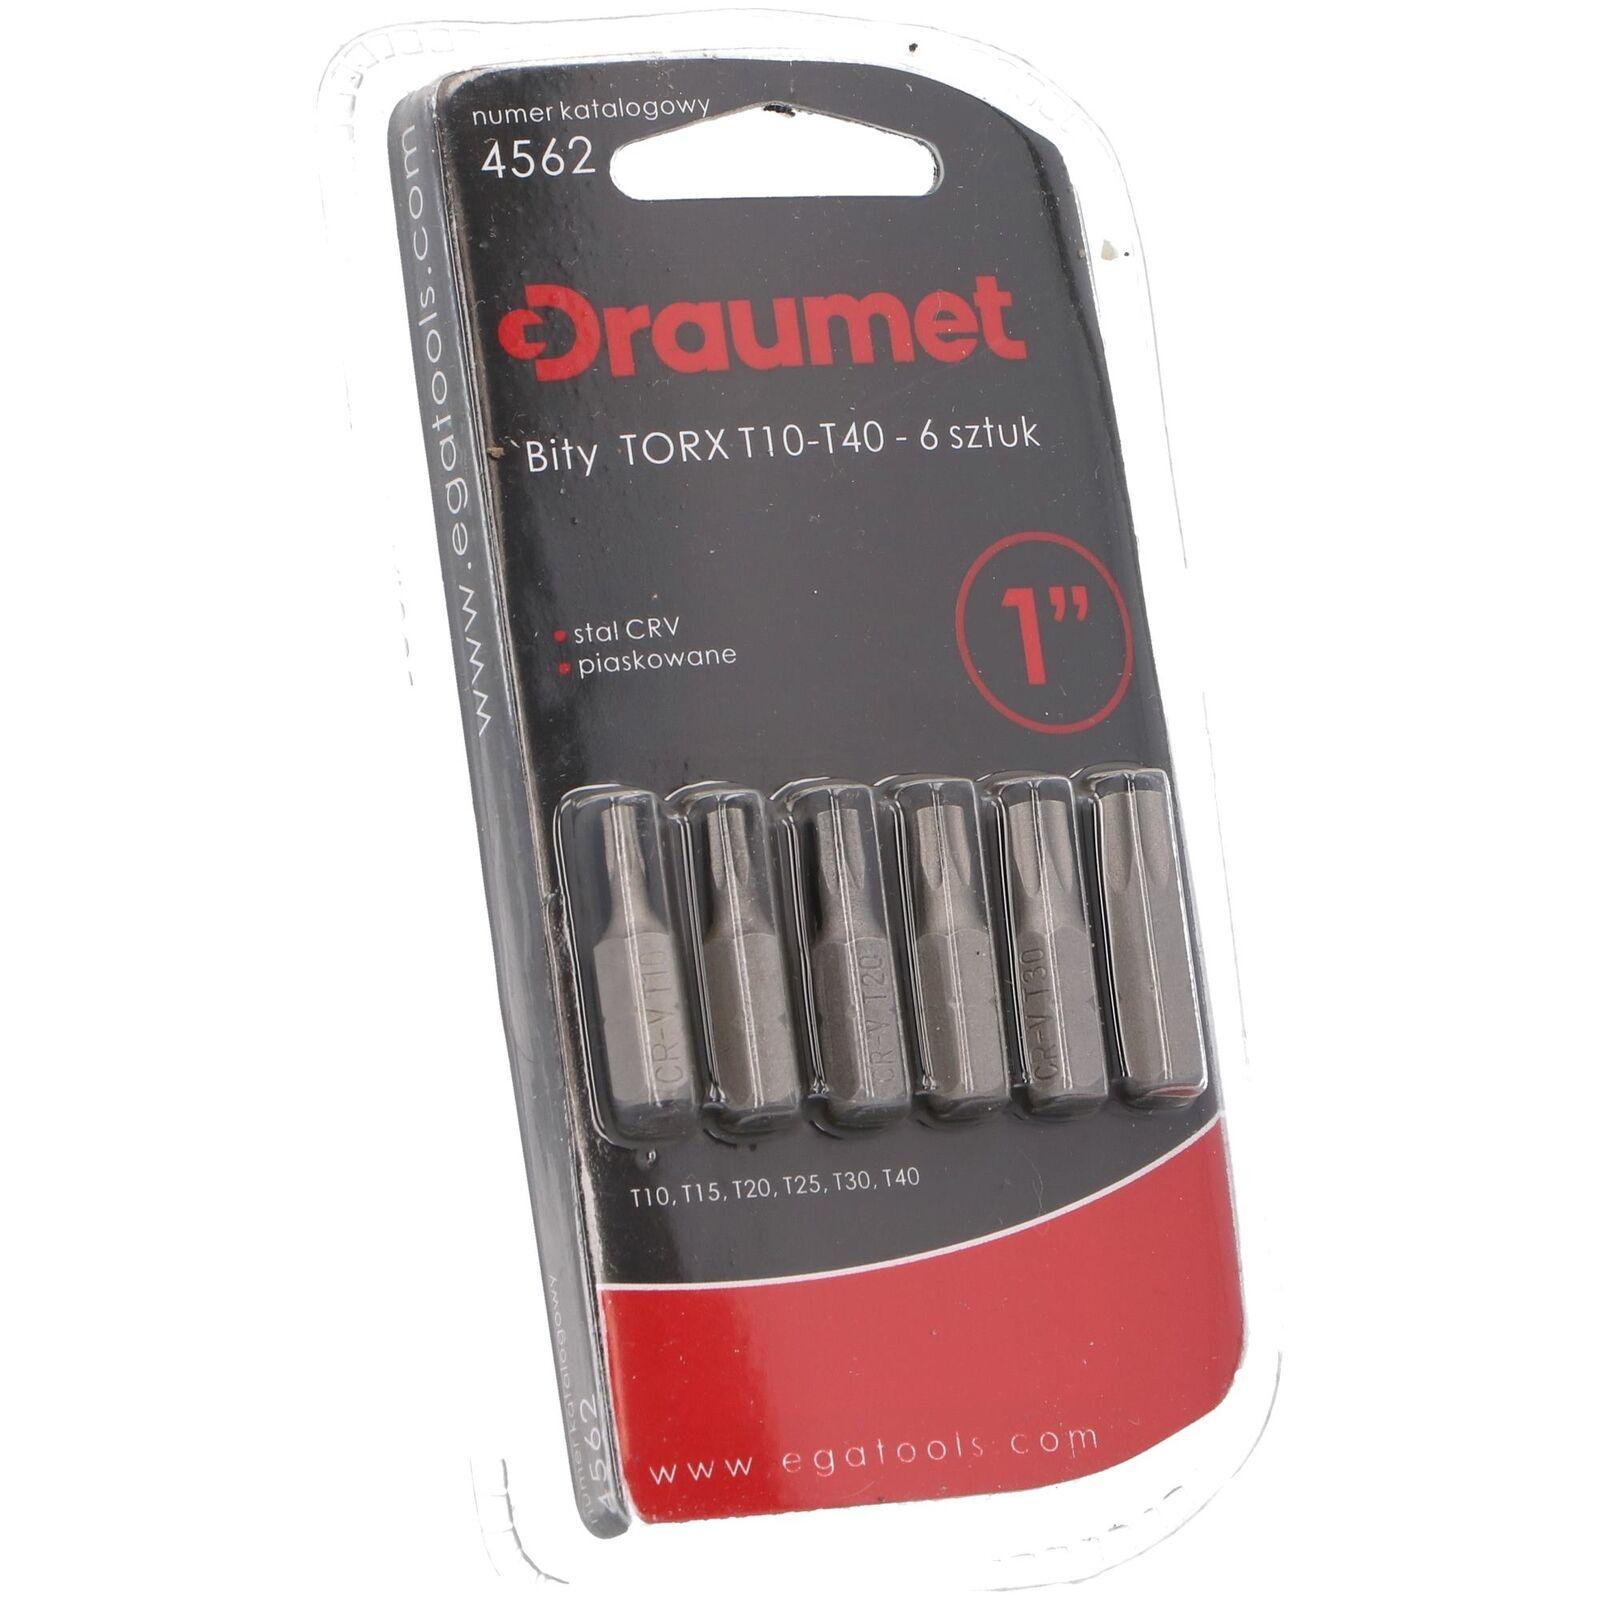 30 tlg DRAUMET Bits Set TORX TX TX 20